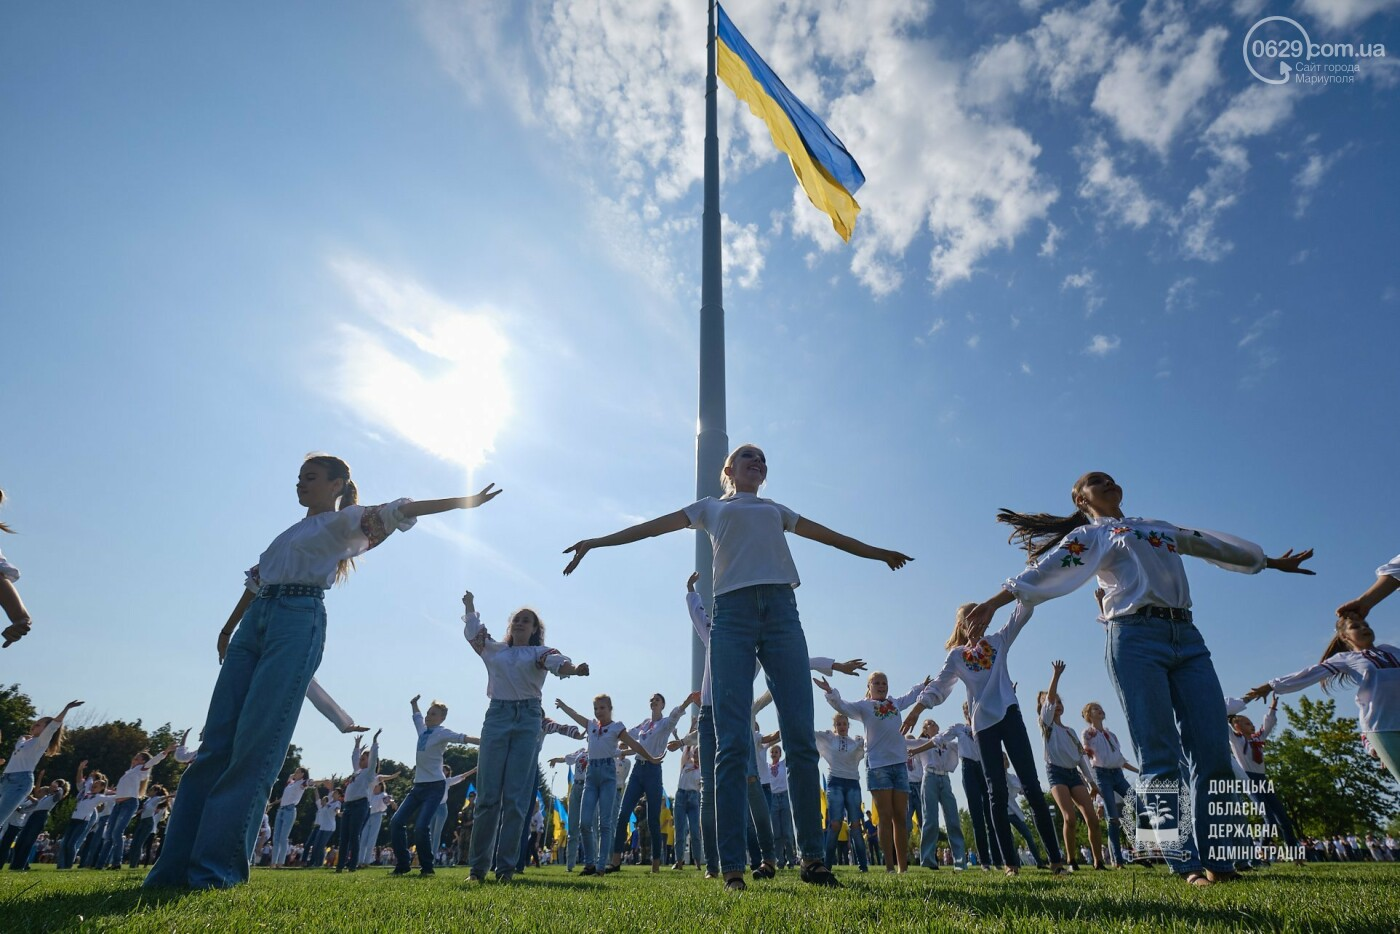 В Донецкой области подняли флаг Украины на 80 метров, - ФОТО, фото-1